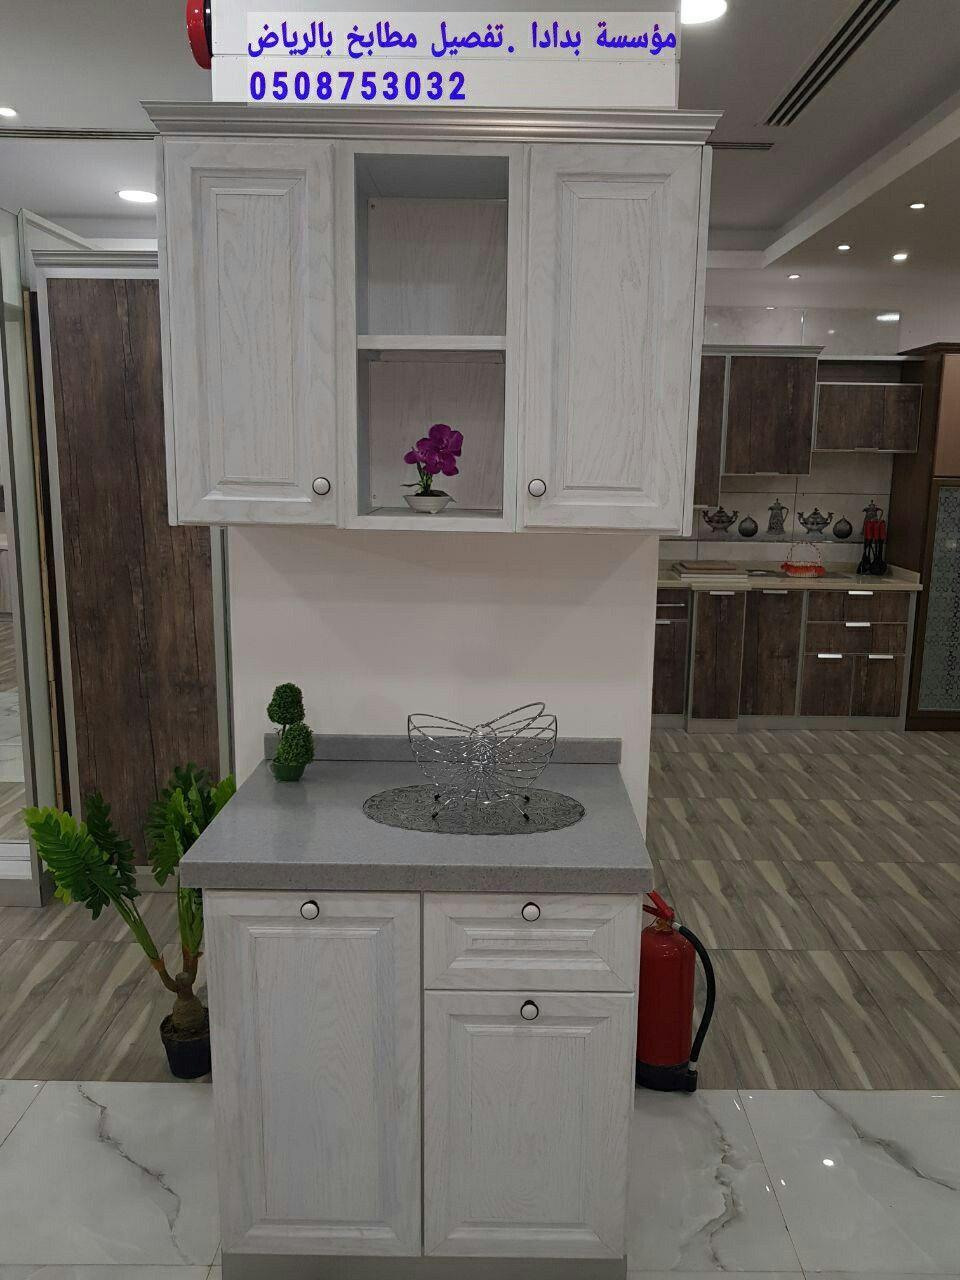 مطابخ المنيوم بالرياض 0508753032 مطابخ خشب في الرياض محلات مطابخ خشب بالرياض محلات مطابخ المنيوم بالرياض افضل محل تفصيل مطابخ Home Decor Kitchen Interior Home